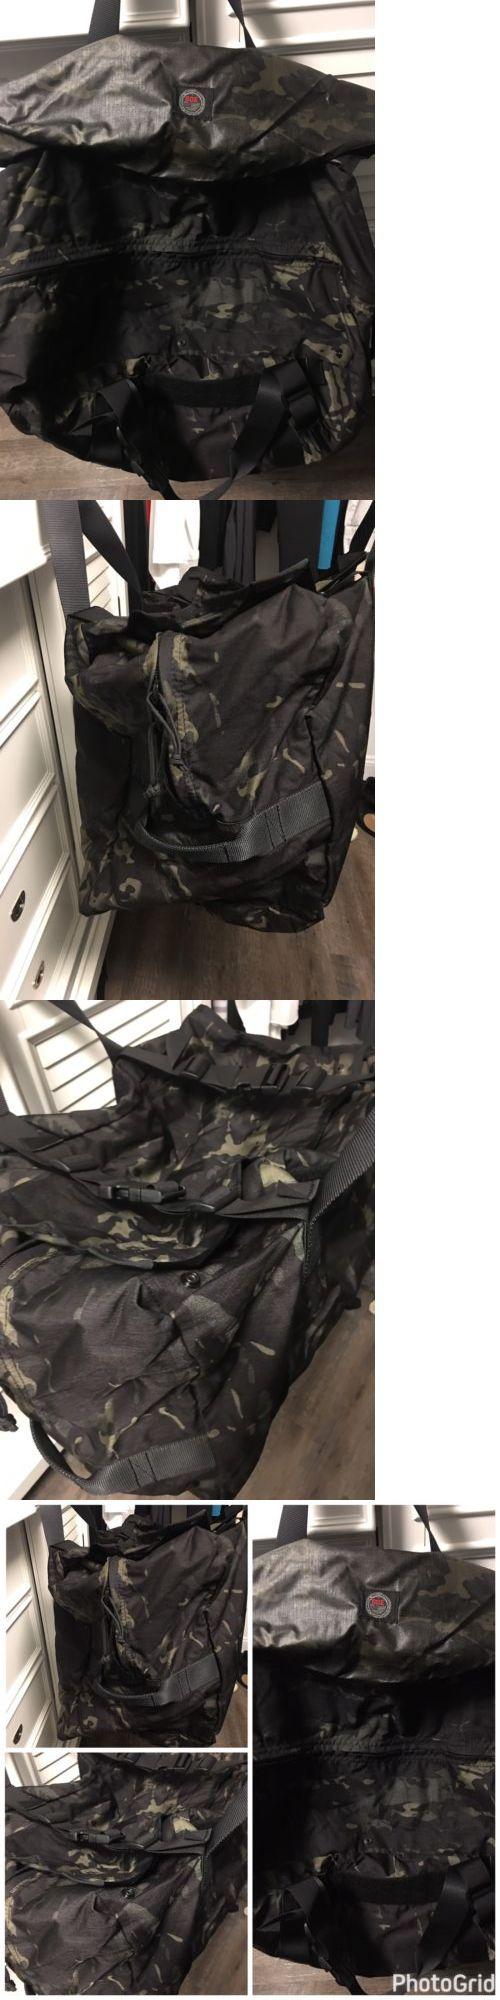 Chest Rigs and Tactical Vests 177891: Soe Special Operations Super Kit Bag John Willis Mcblk Multicam Black No Eta Bag -> BUY IT NOW ONLY: $150 on eBay!